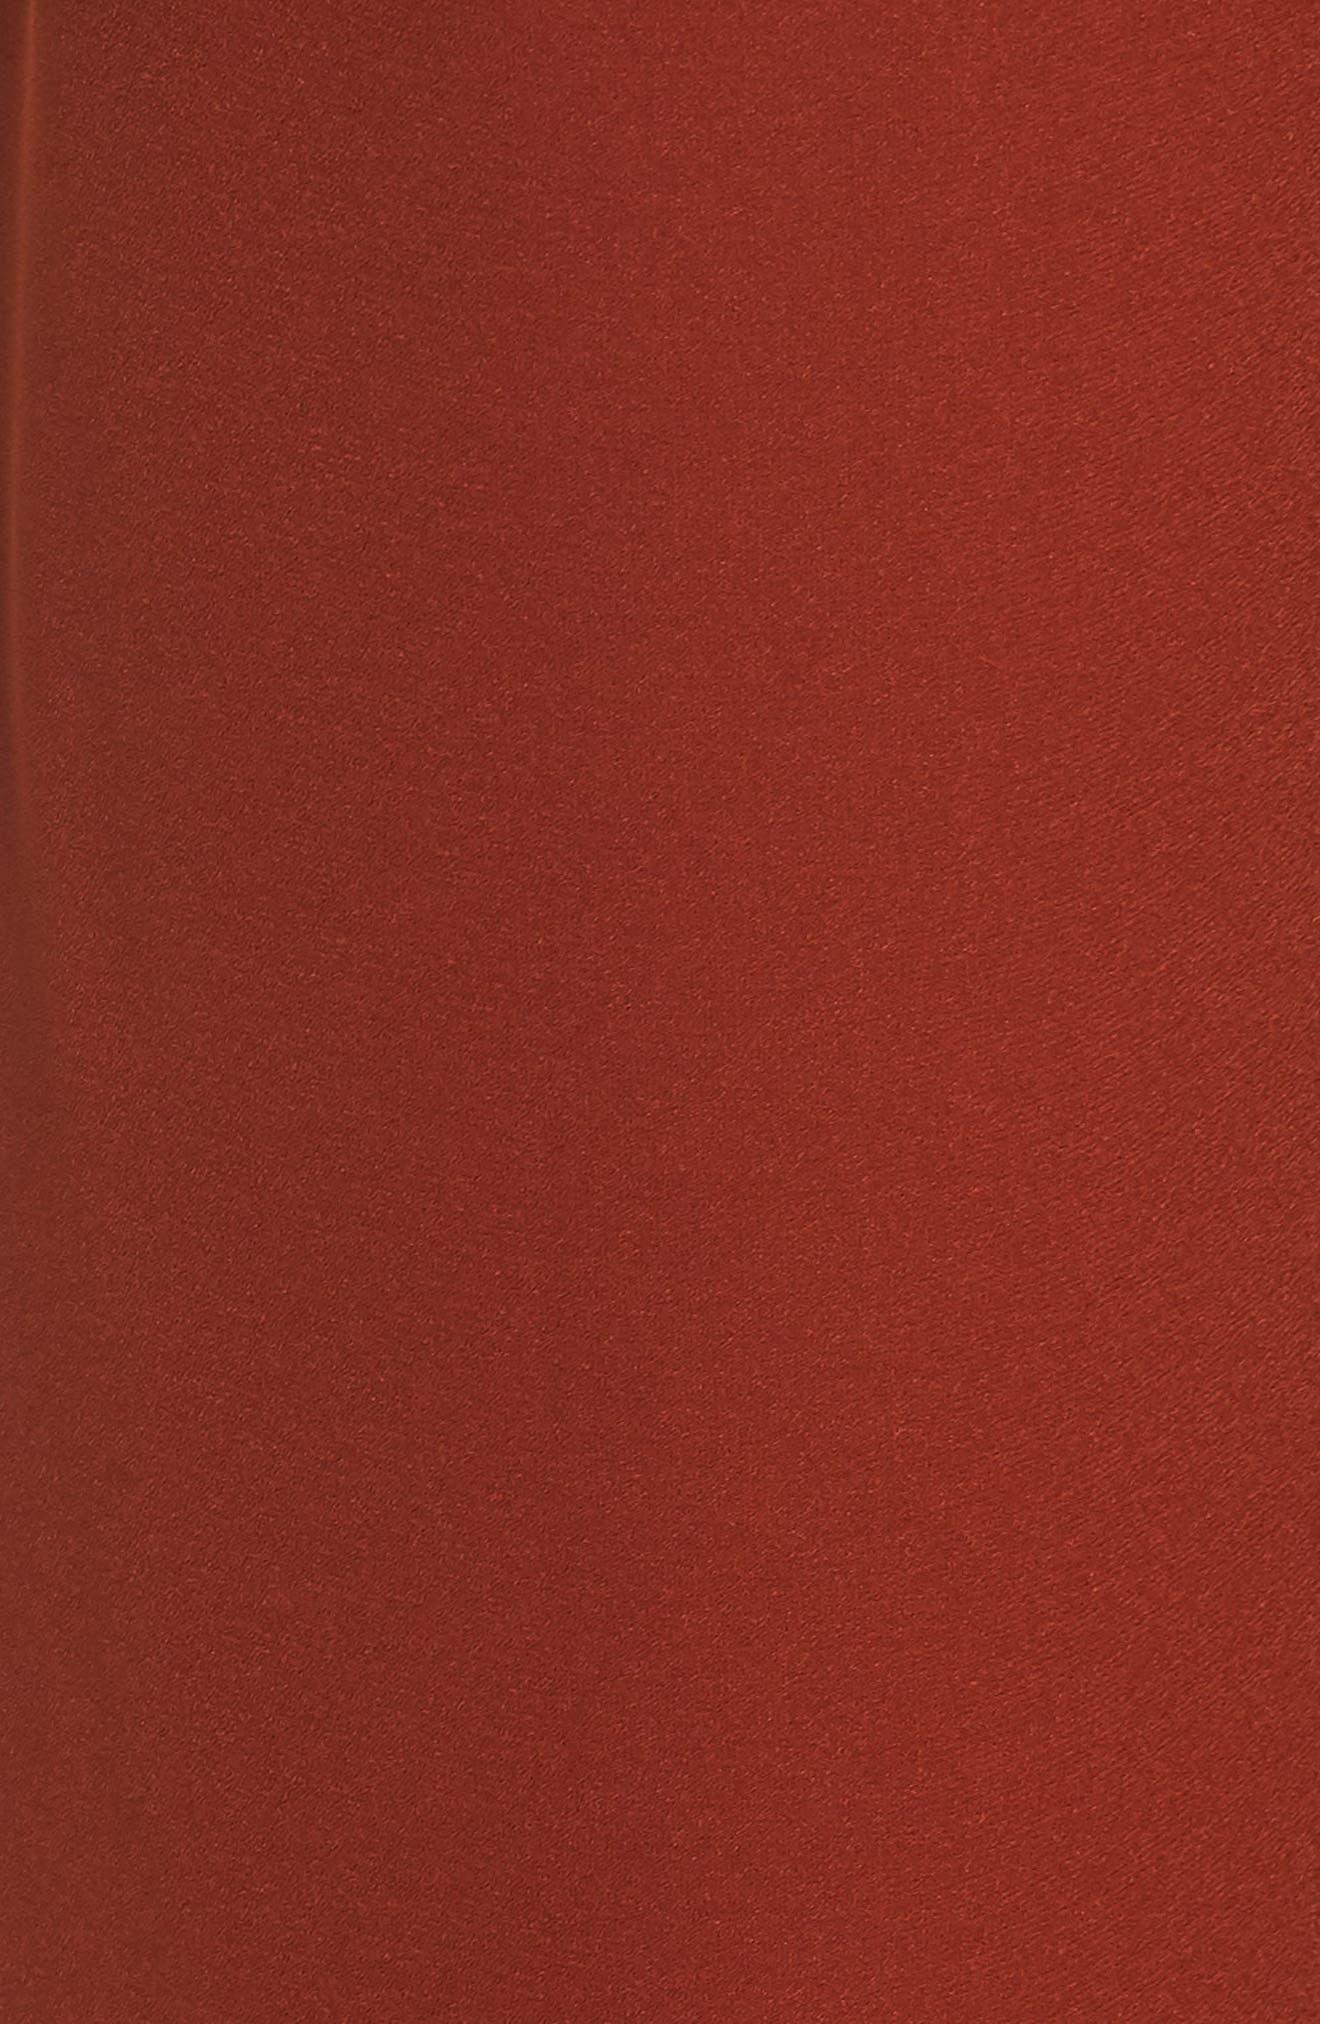 V-Neck Jumpsuit,                             Alternate thumbnail 6, color,                             930